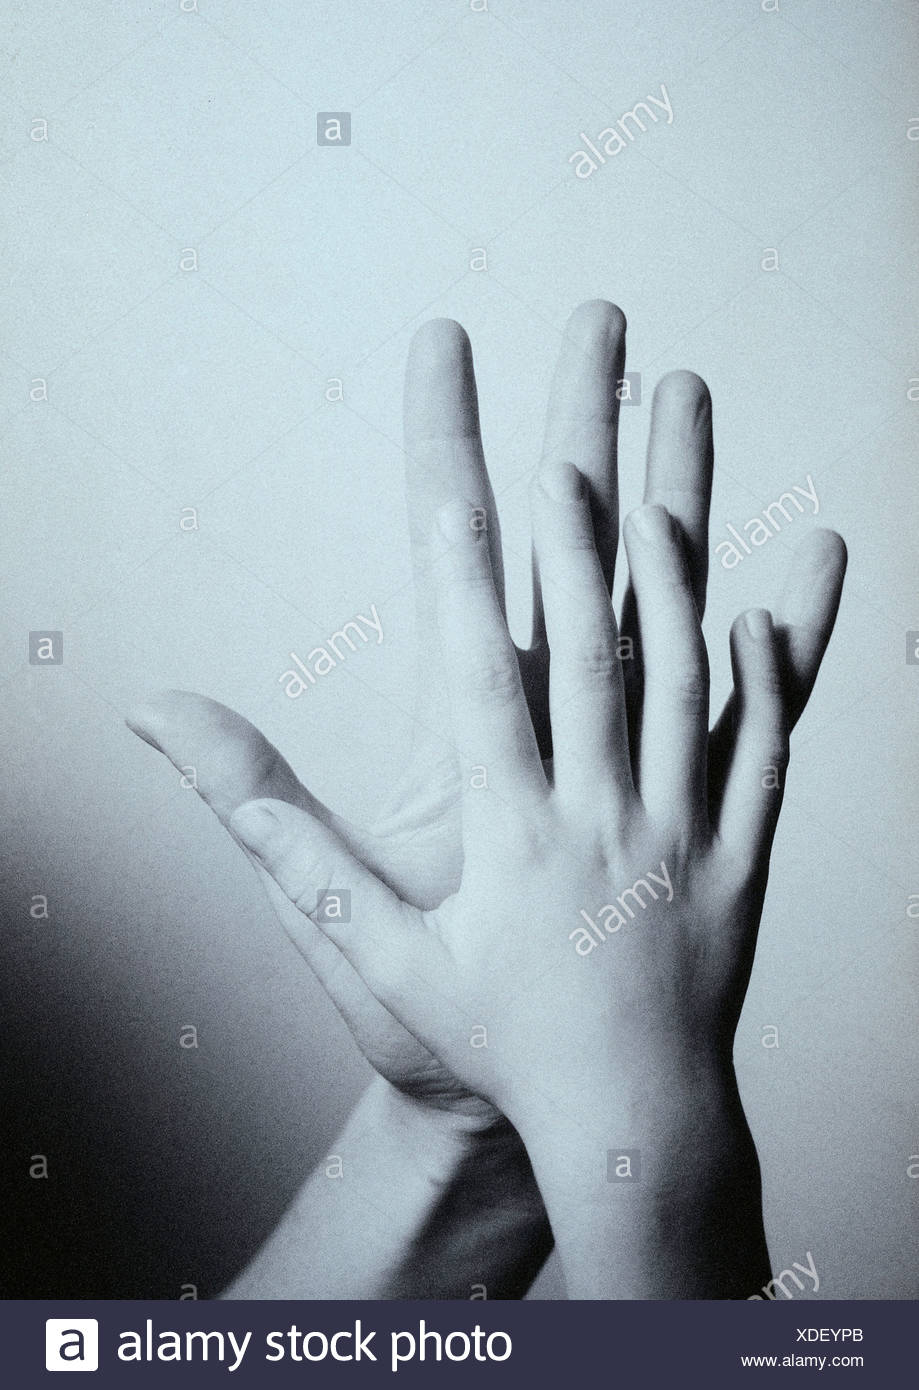 Bambino toccando a mano mano d'uomo, palmo a palmo, close-up Immagini Stock